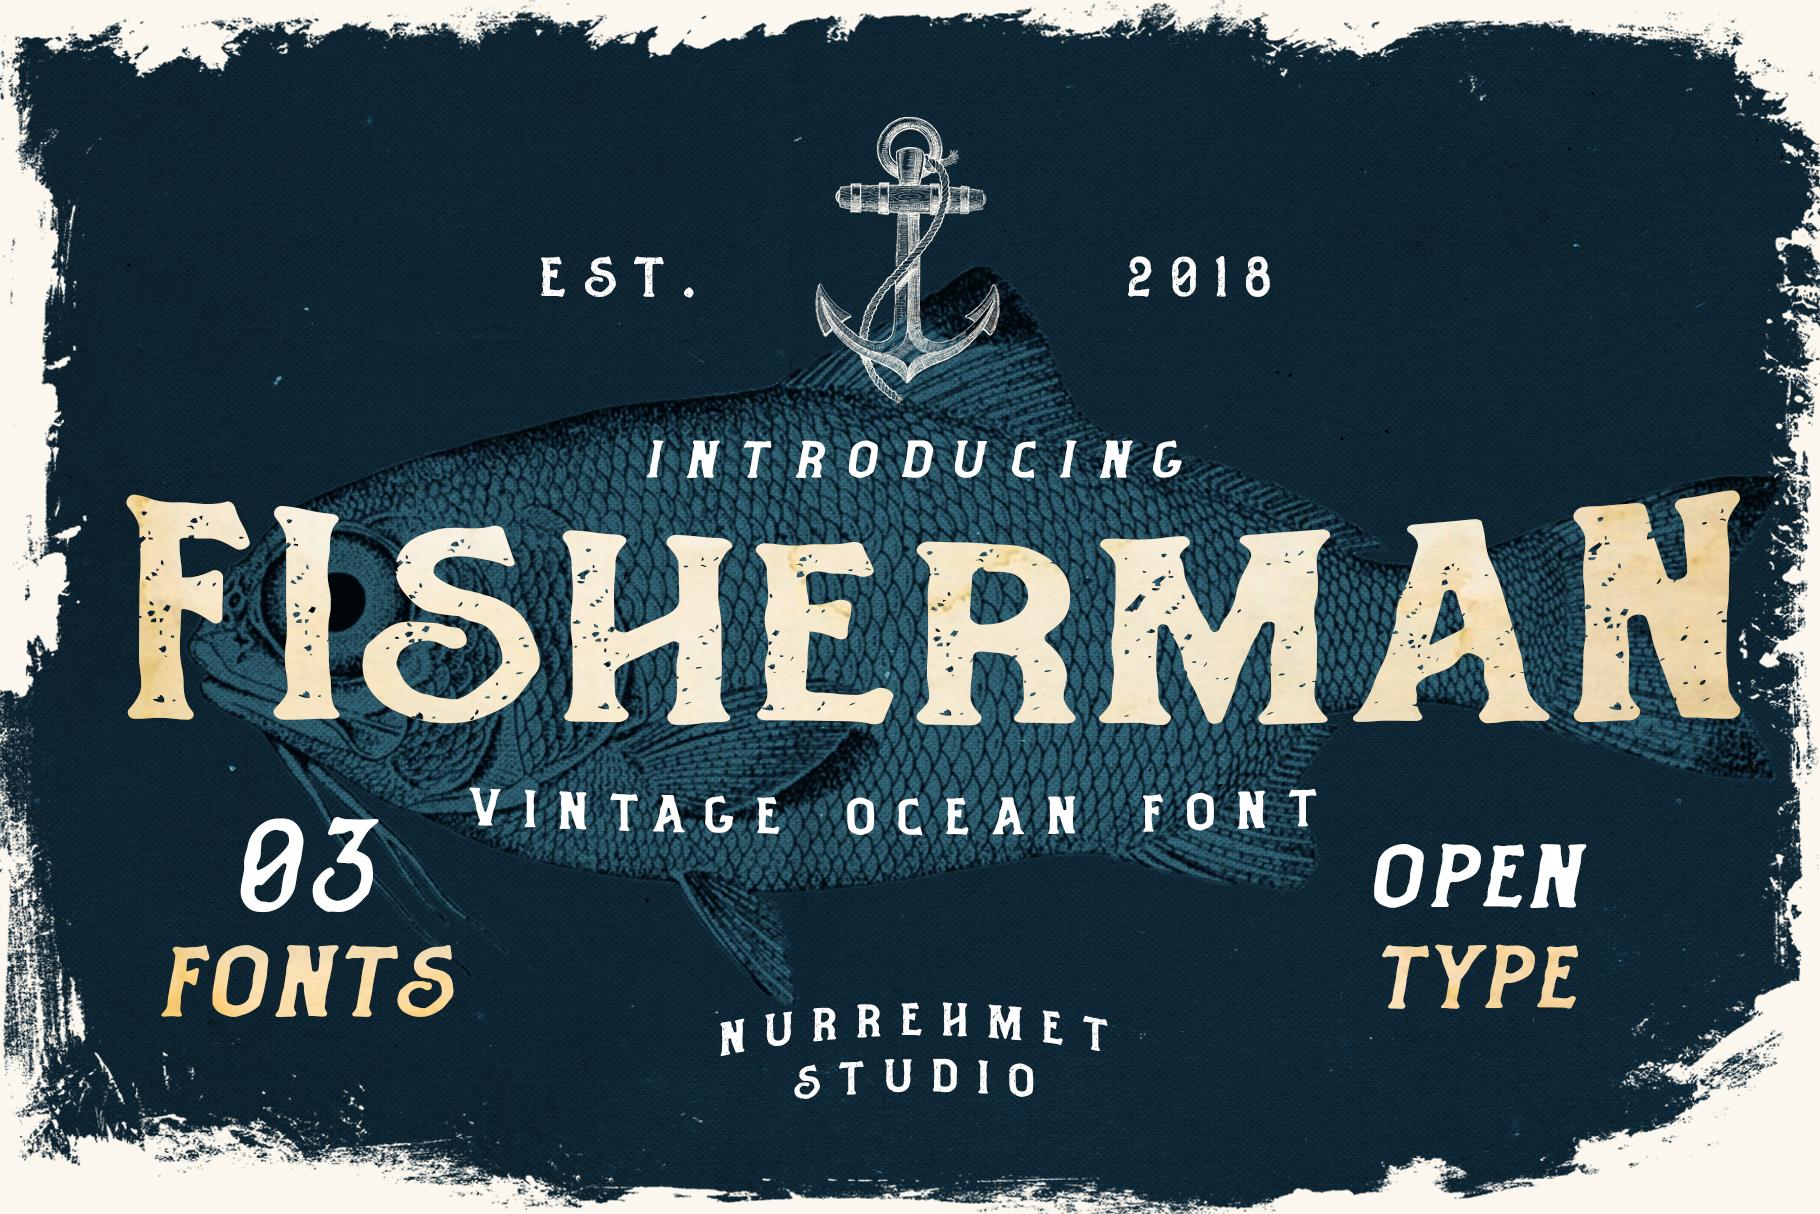 Fisherman - Vintage Ocean Font example image 1